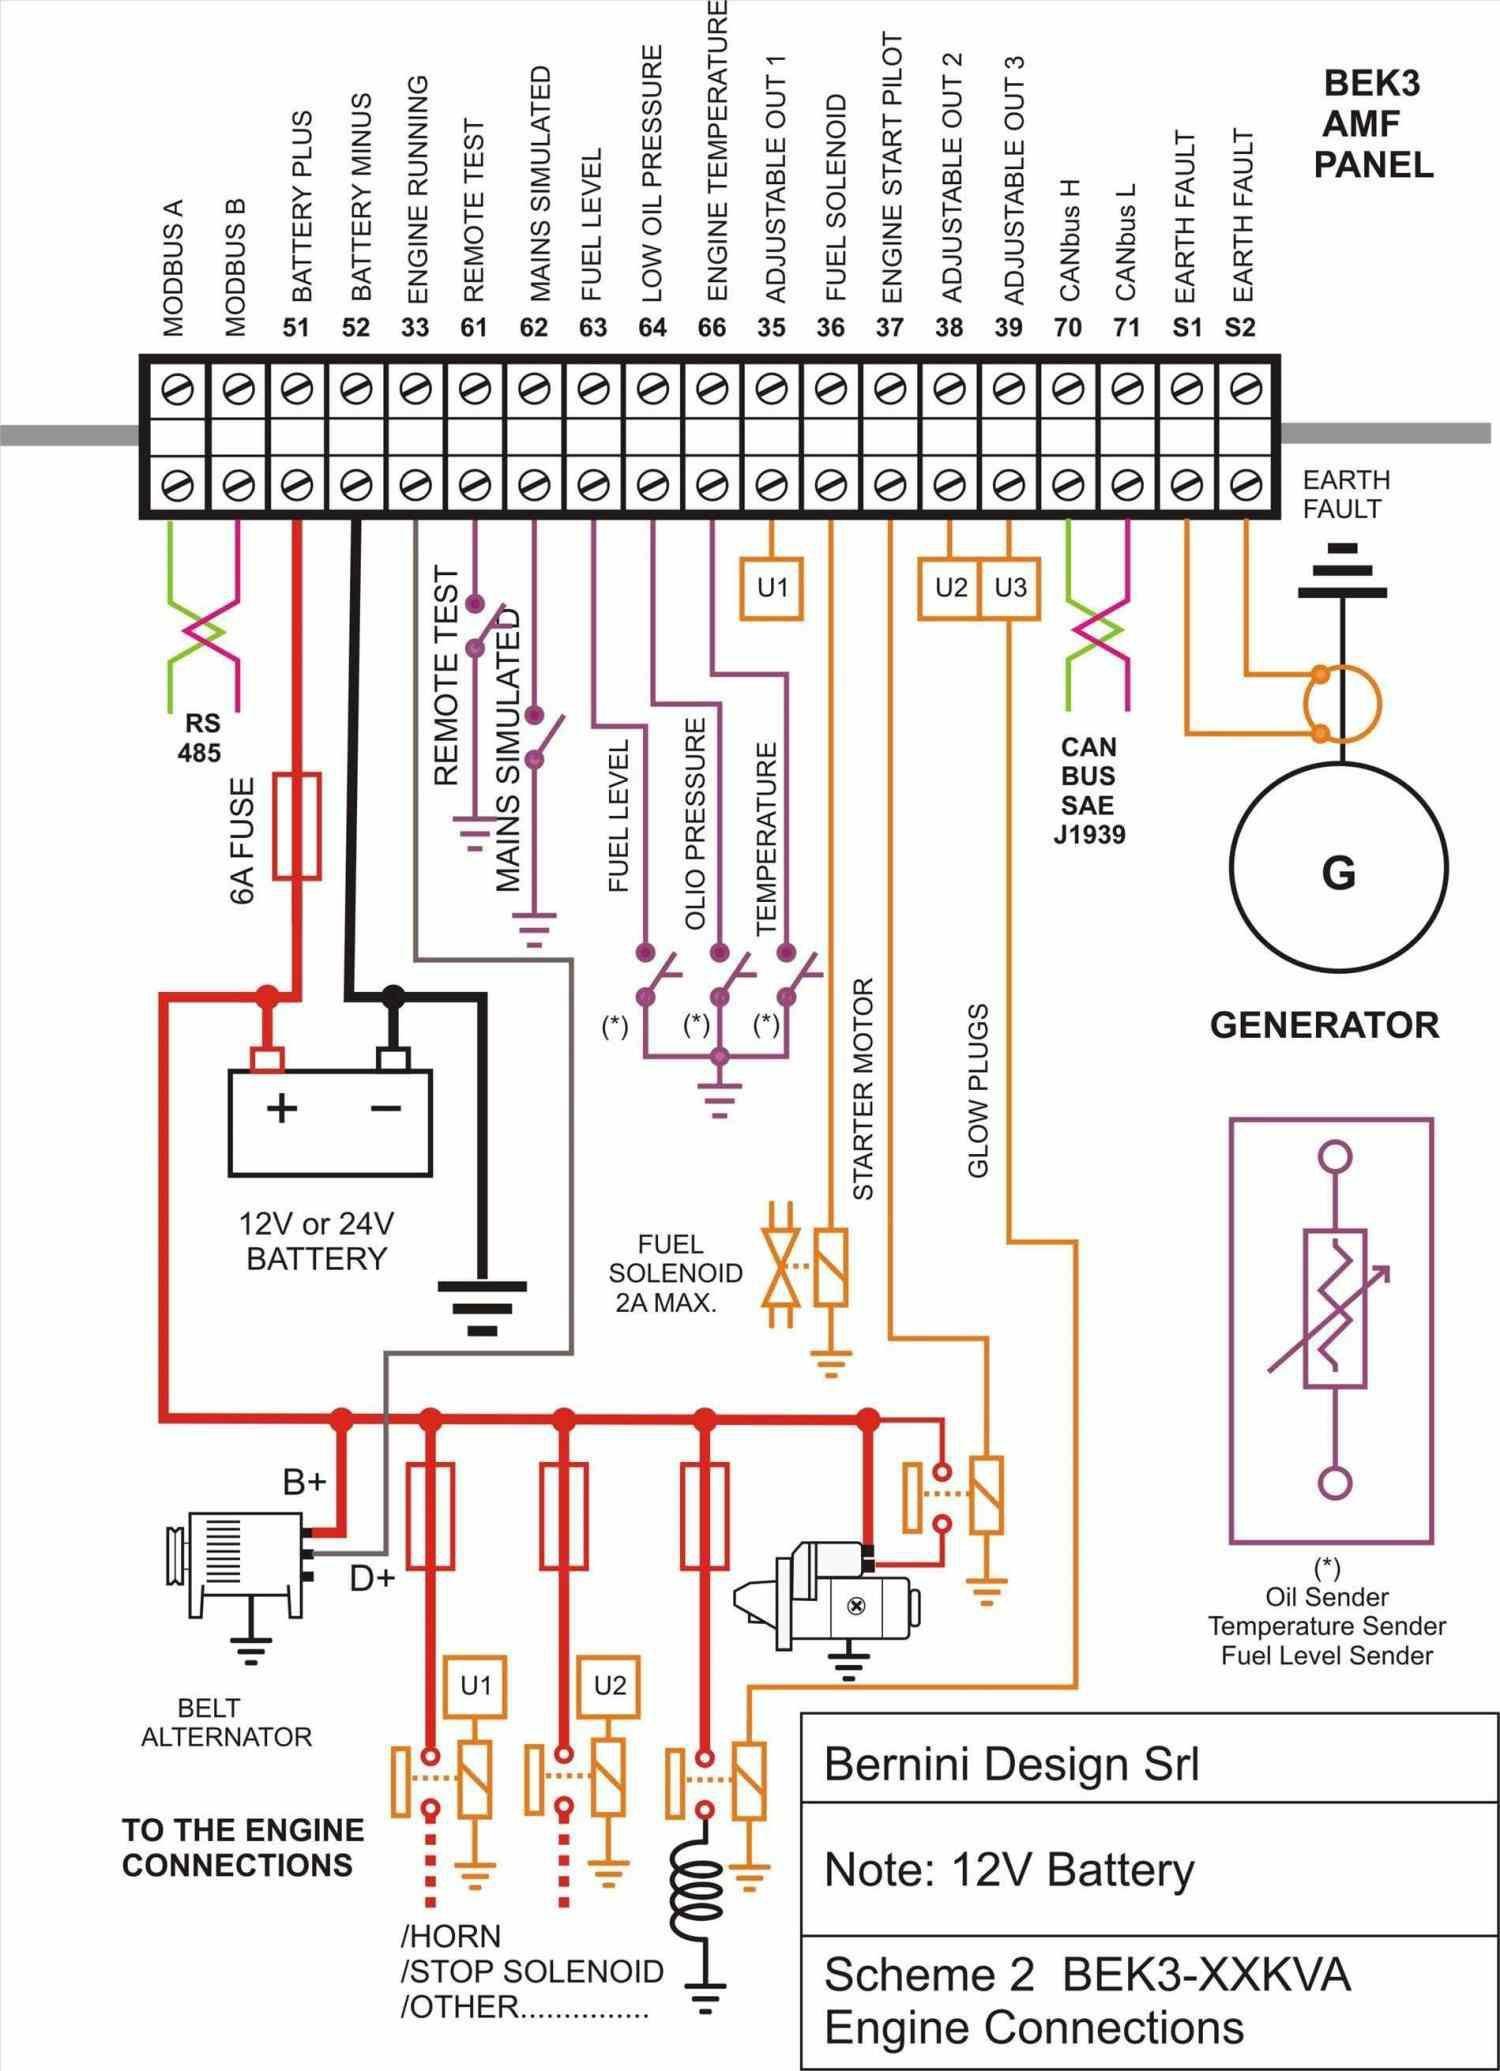 Honeywell Thermostat Wiring Diagram Th 52200 | Wiring Diagram - Honeywell Lyric T5 Wiring Diagram